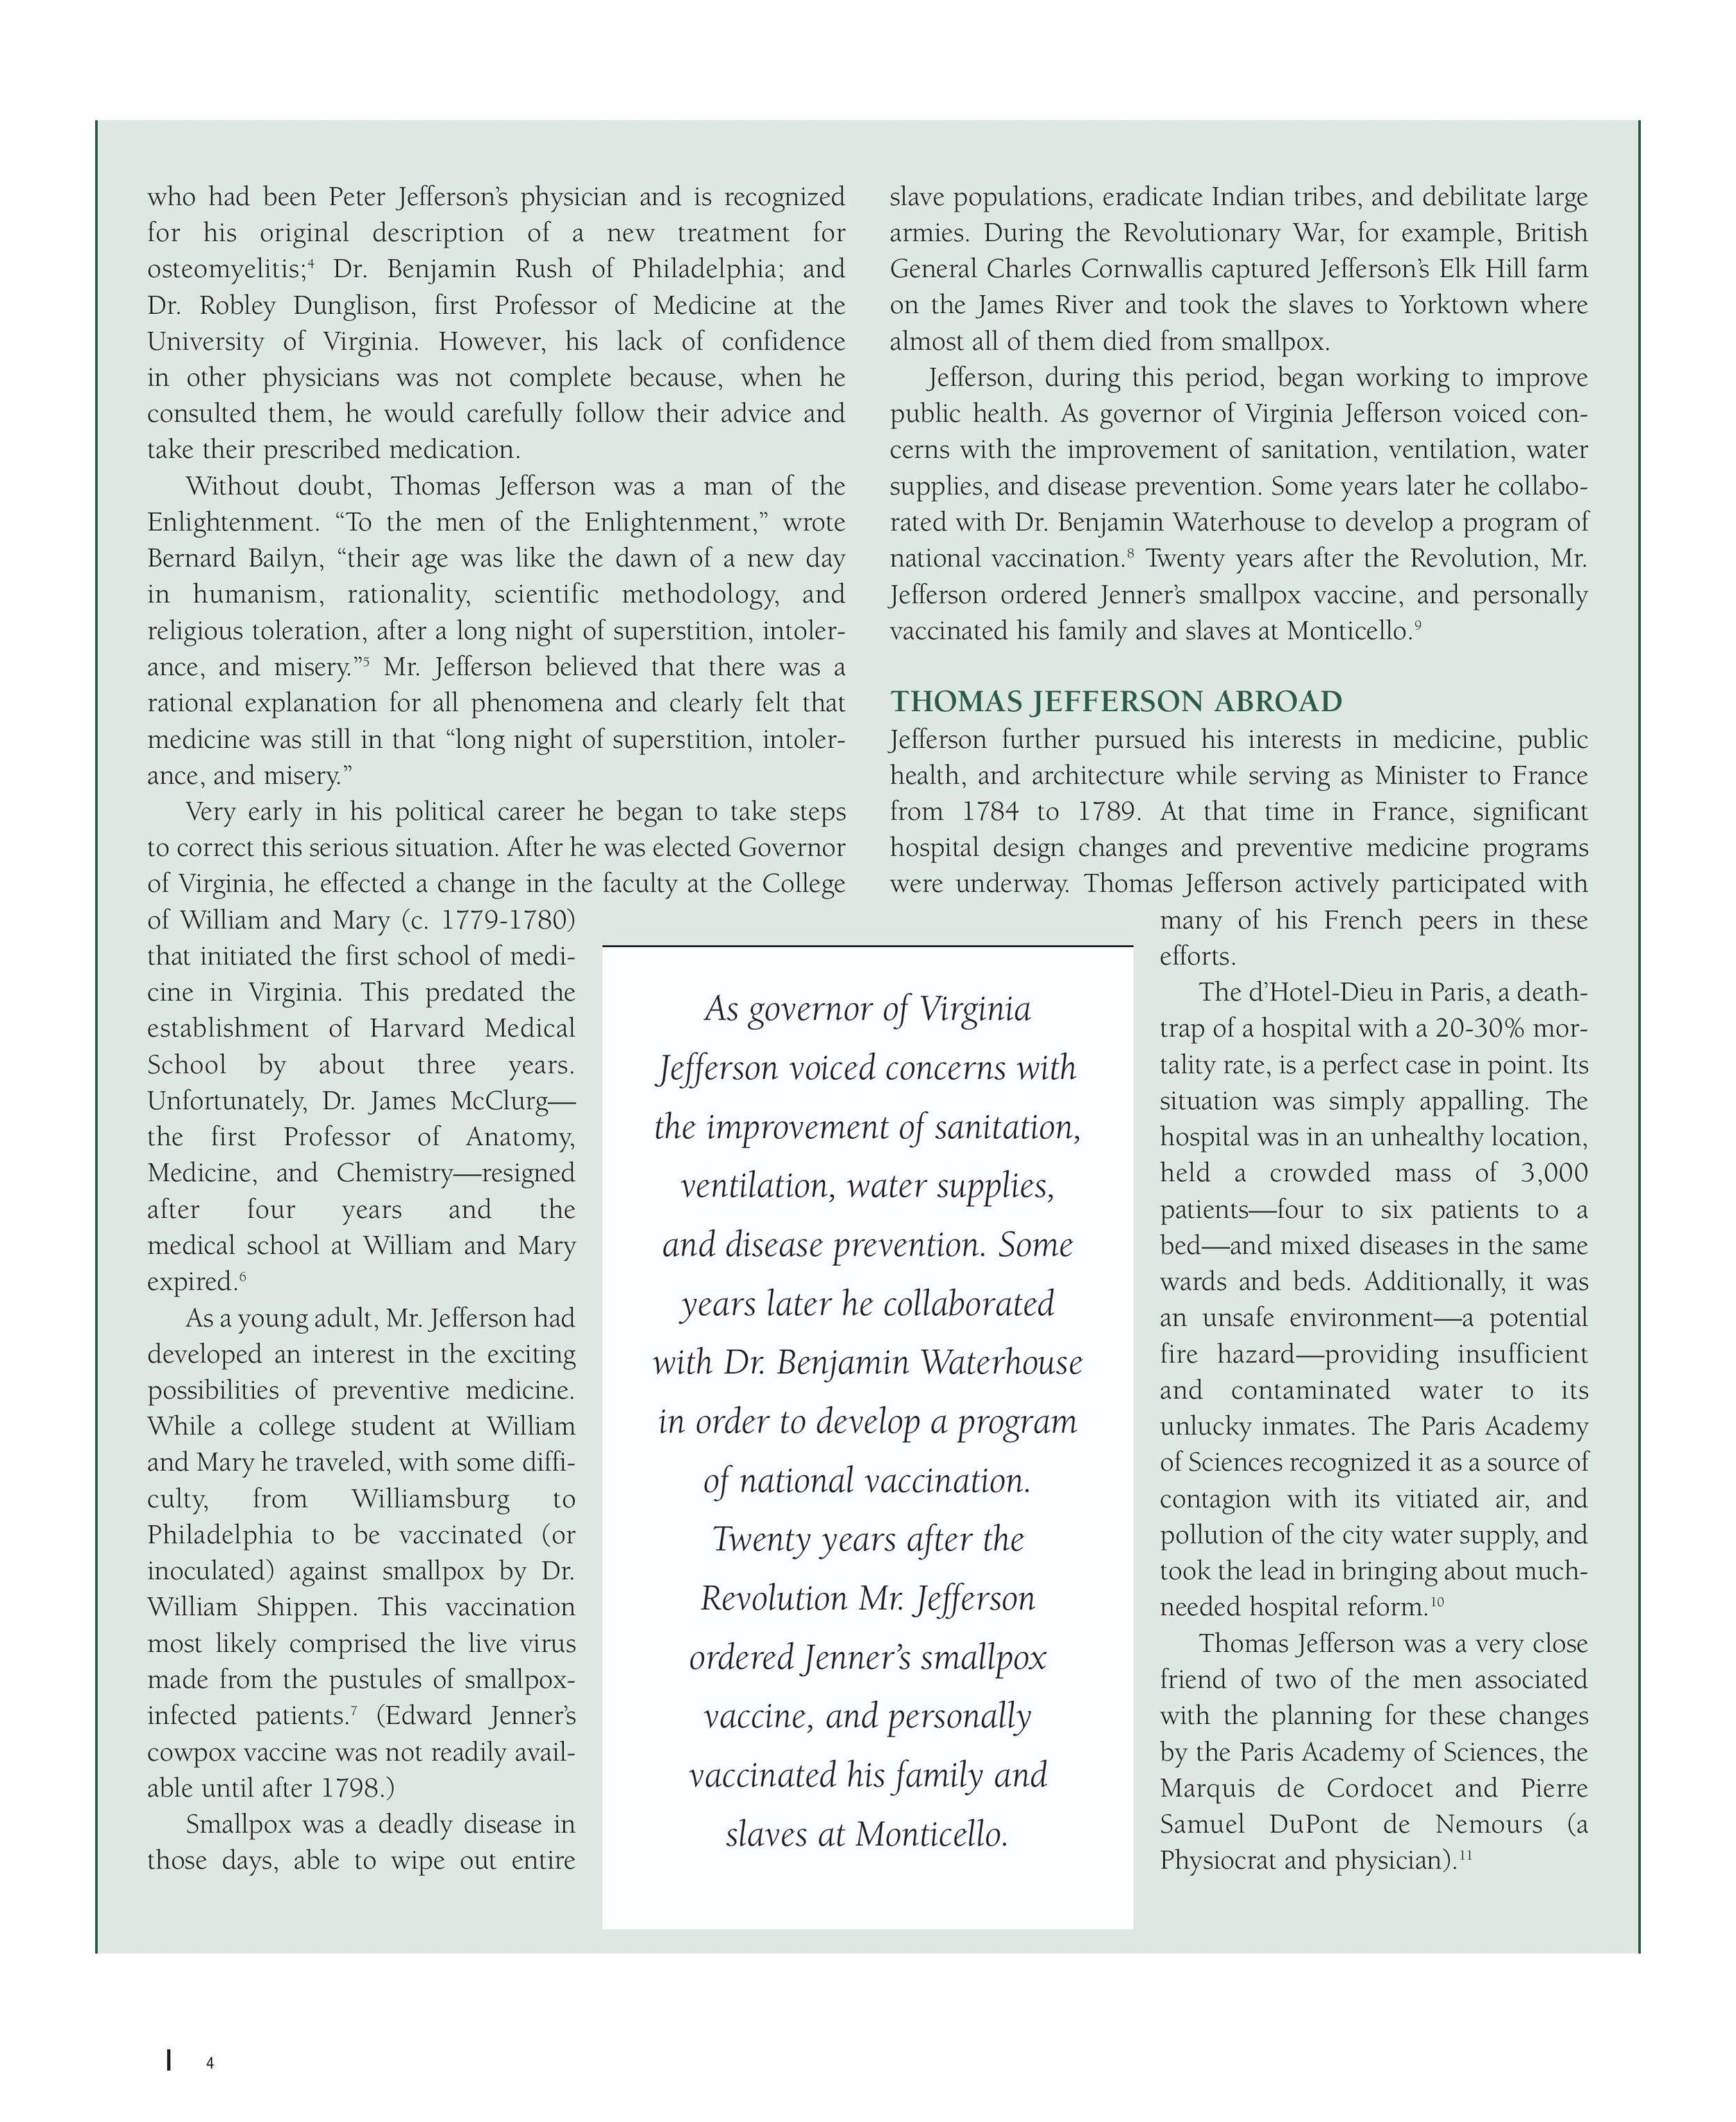 Jefferson_and_medicine-page-002.jpg